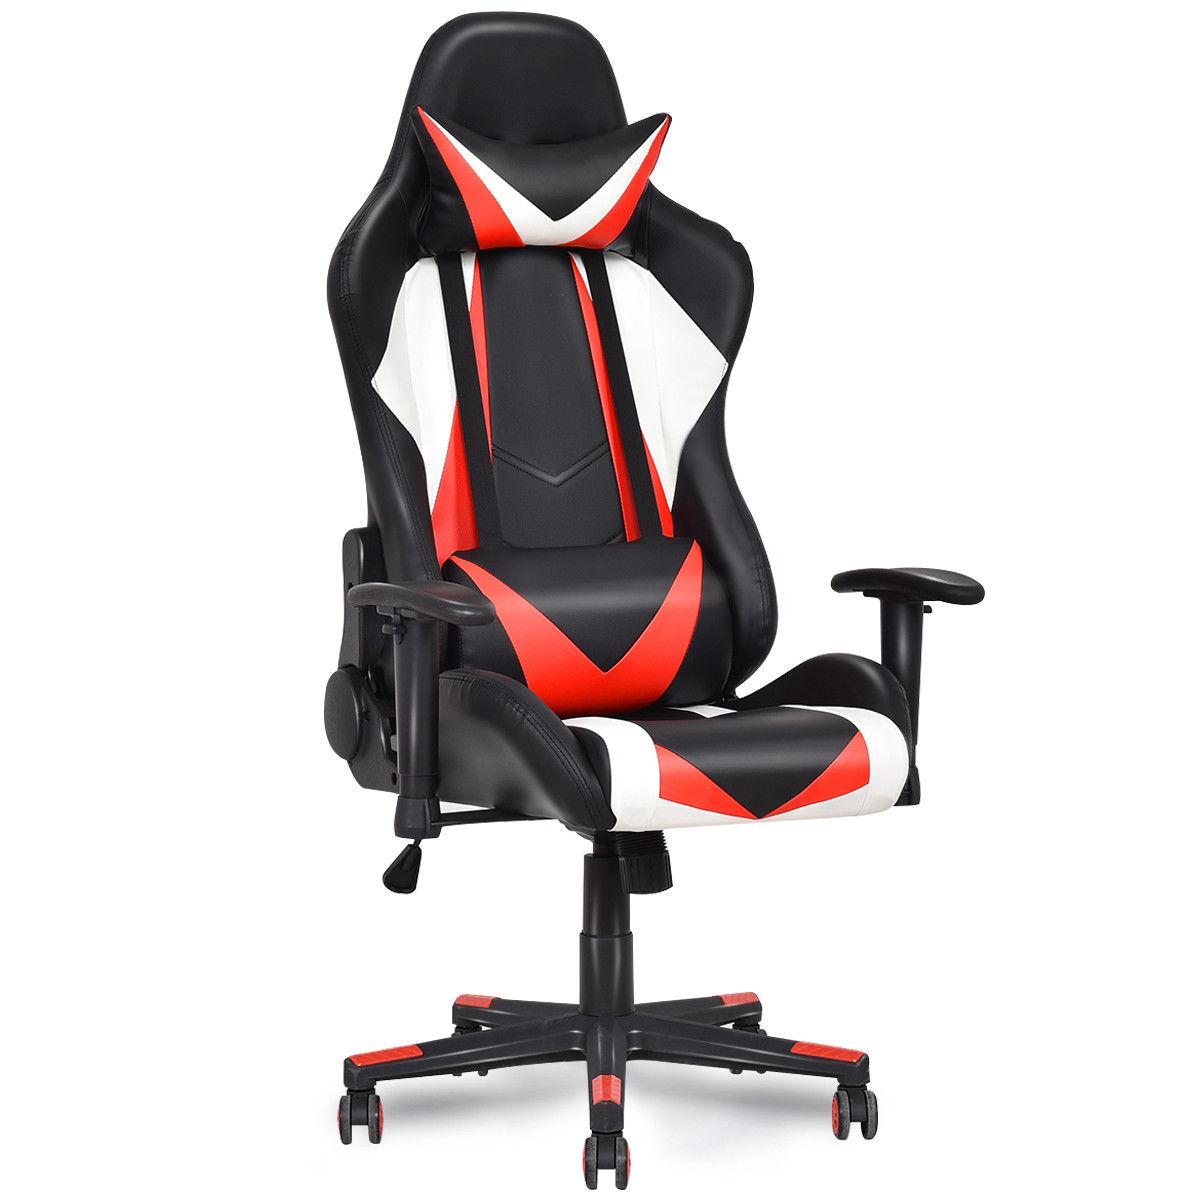 giantex racing style high back recliner gaming chair modern mesh